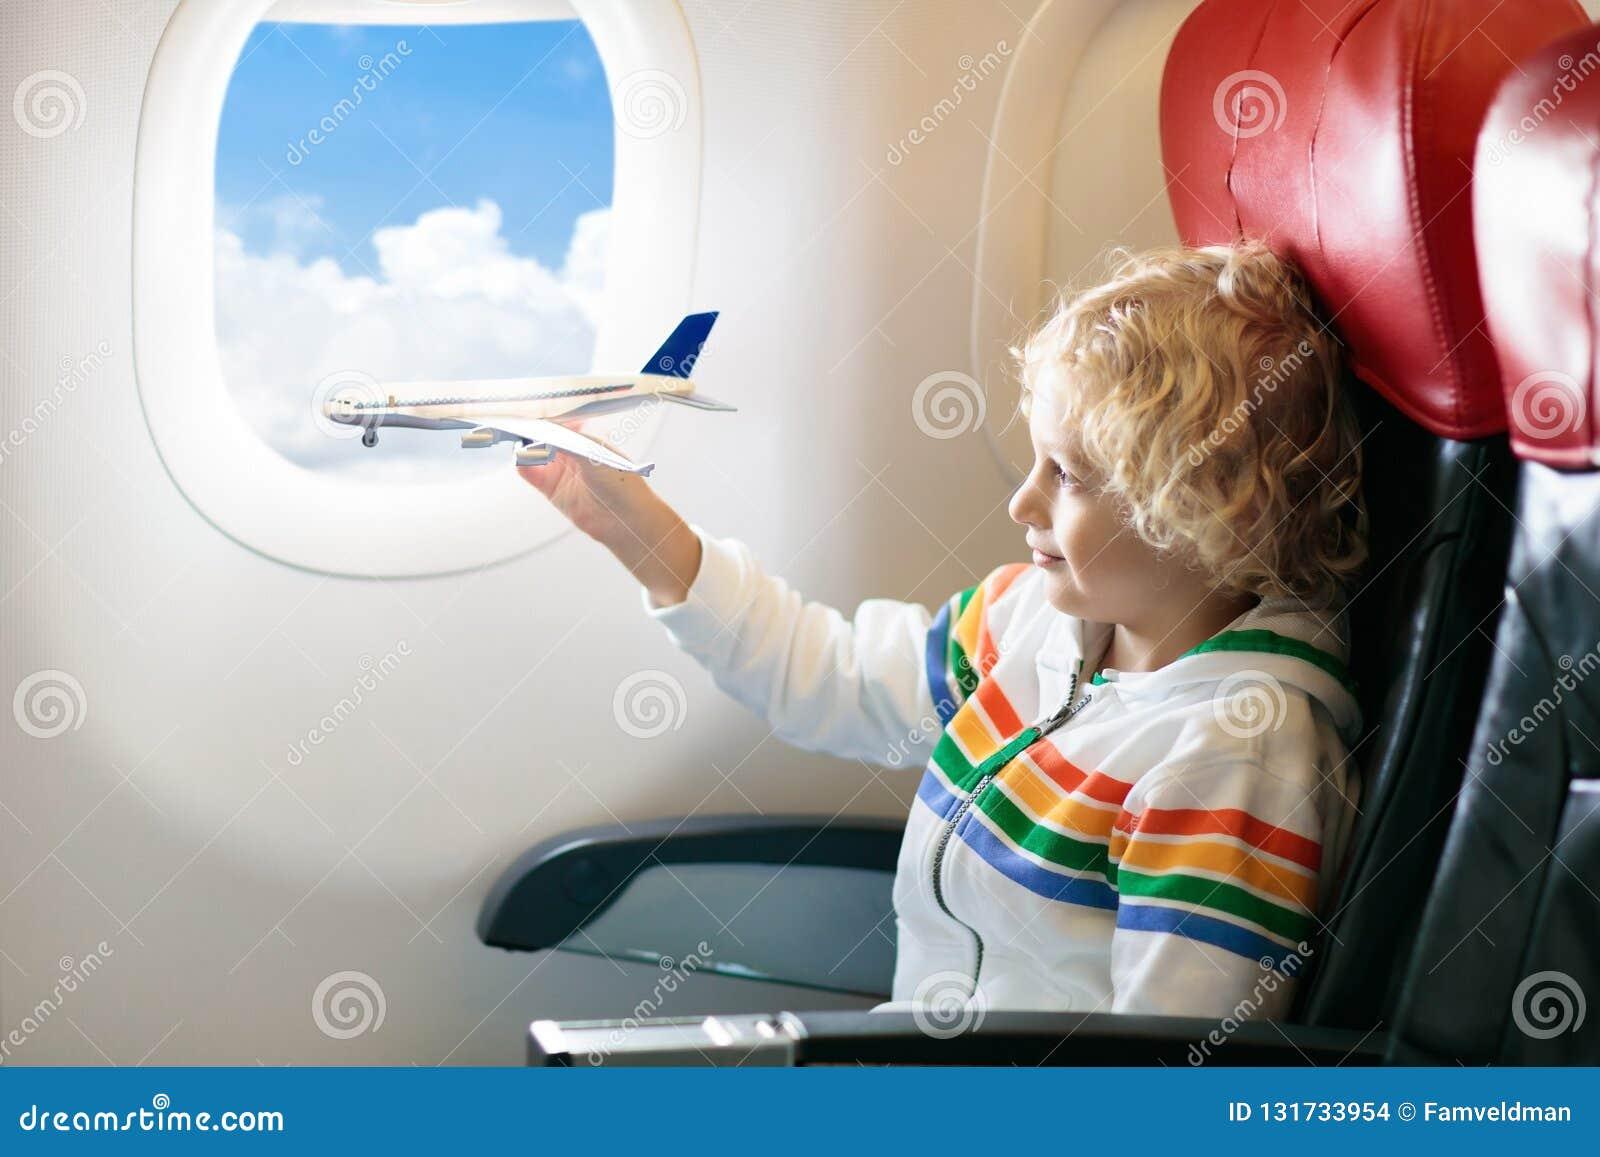 Child In Airplane Kid In Air Plane Sitting In Window Seat Flight